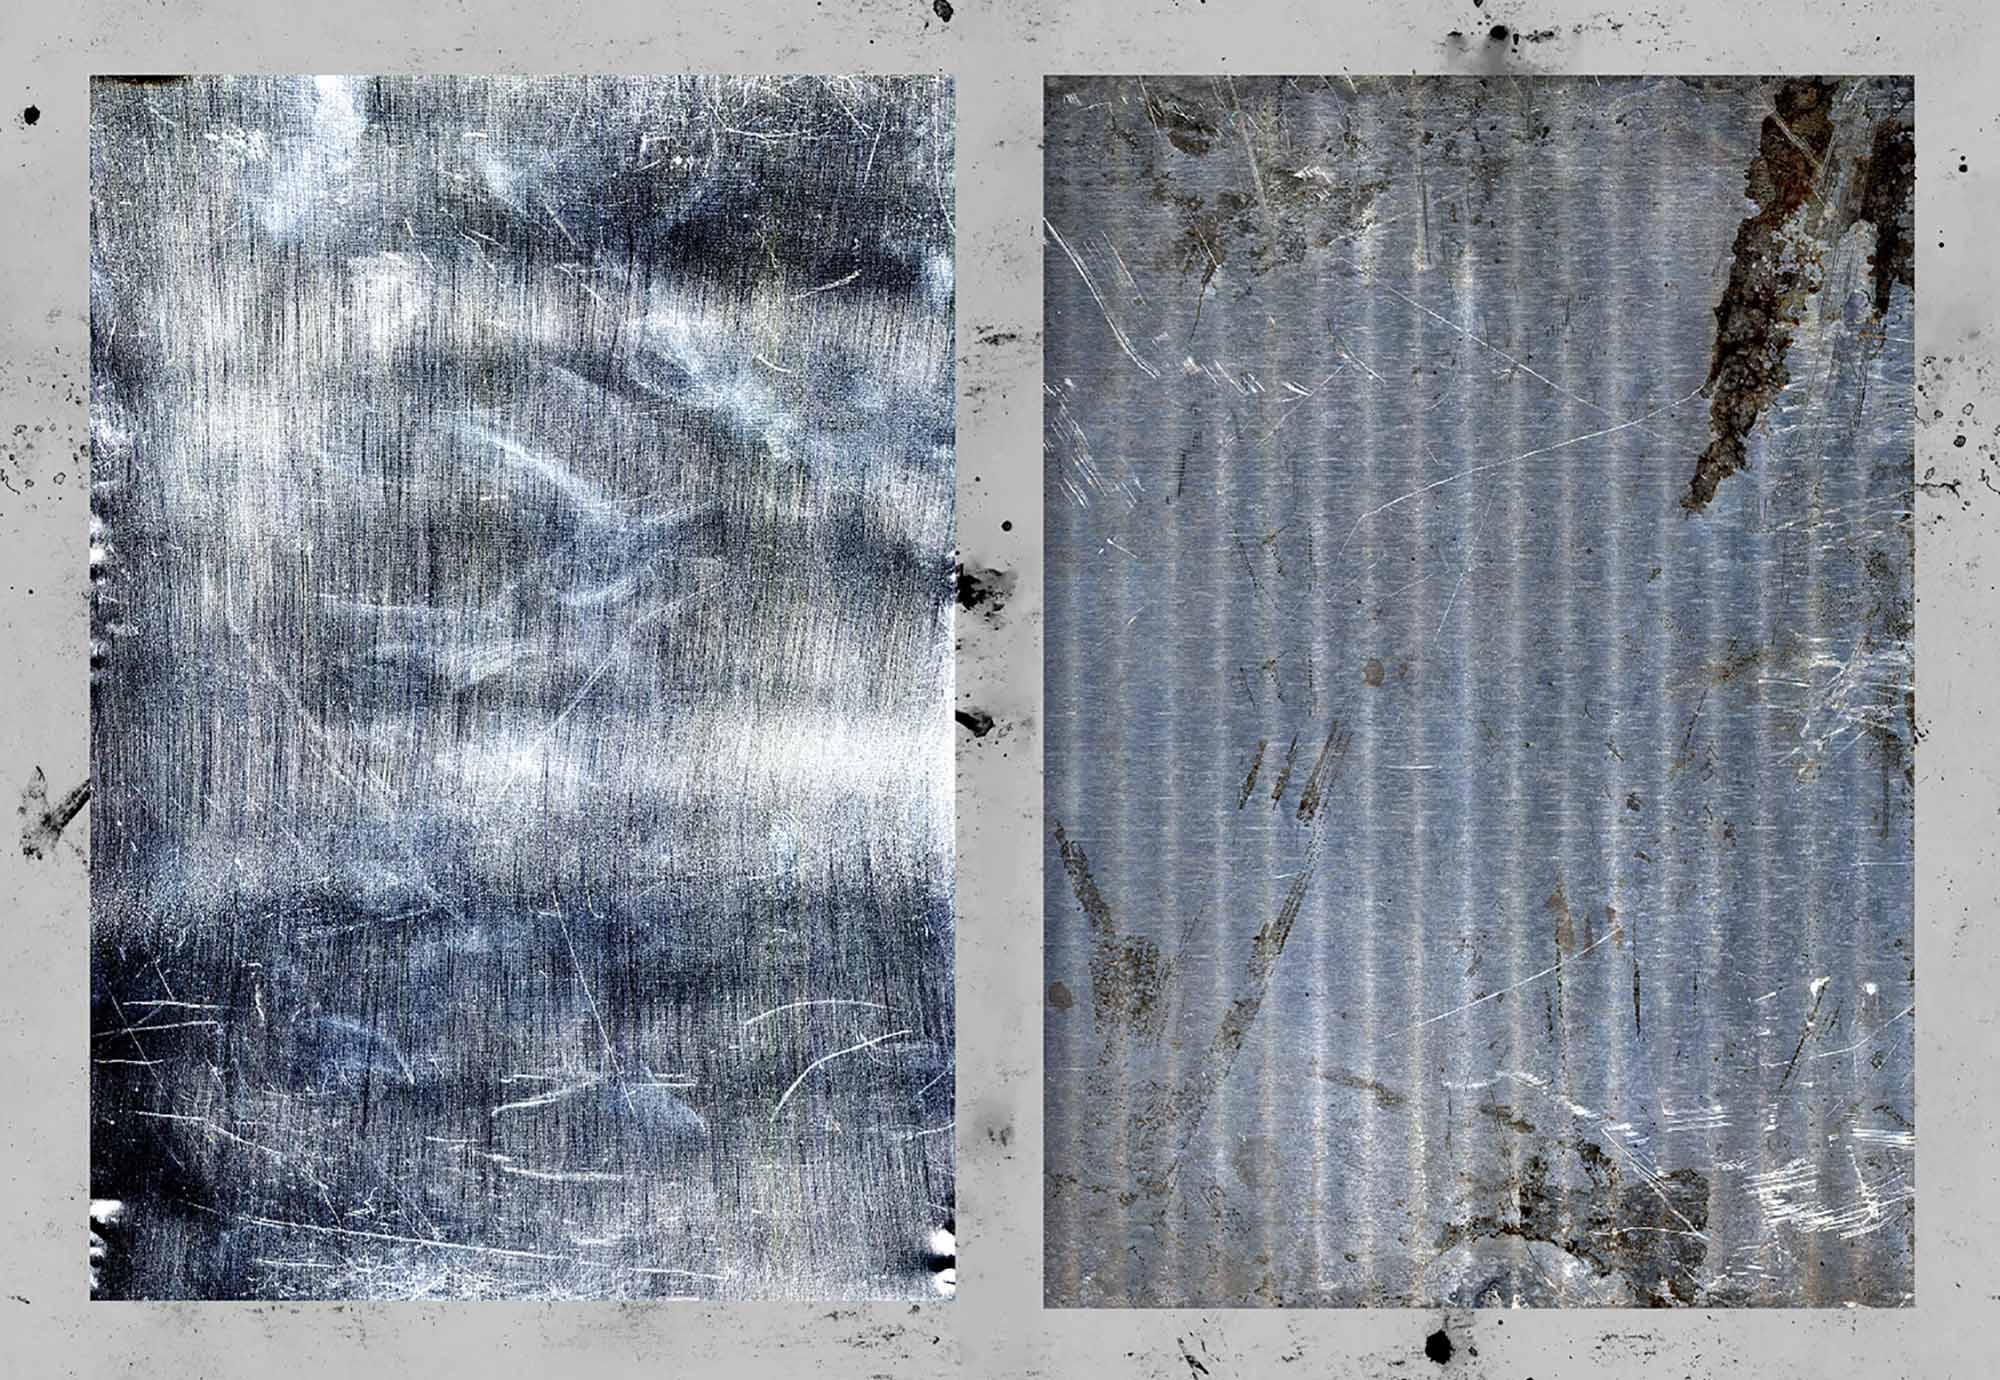 Dusty Inklab Grunge Textures 4